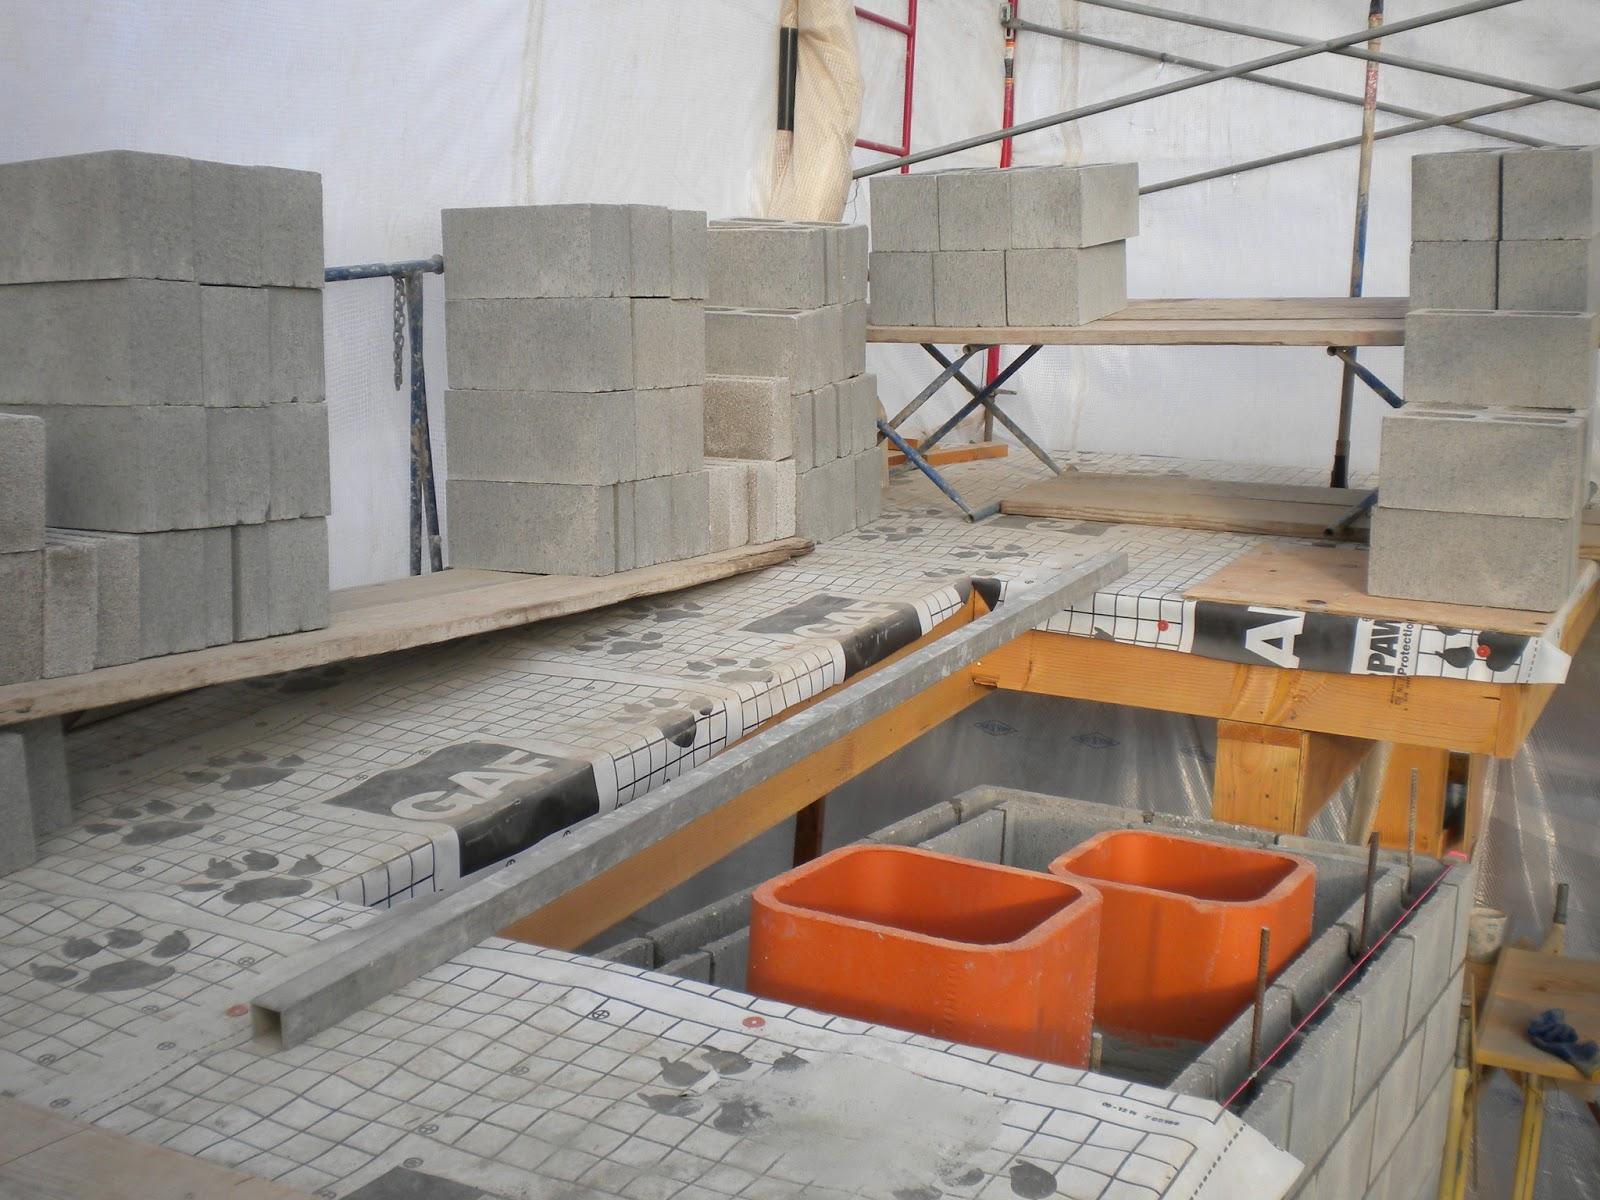 Cmu Chimney Blocks : Boisineau masonry cmu chase and flue liners are now at